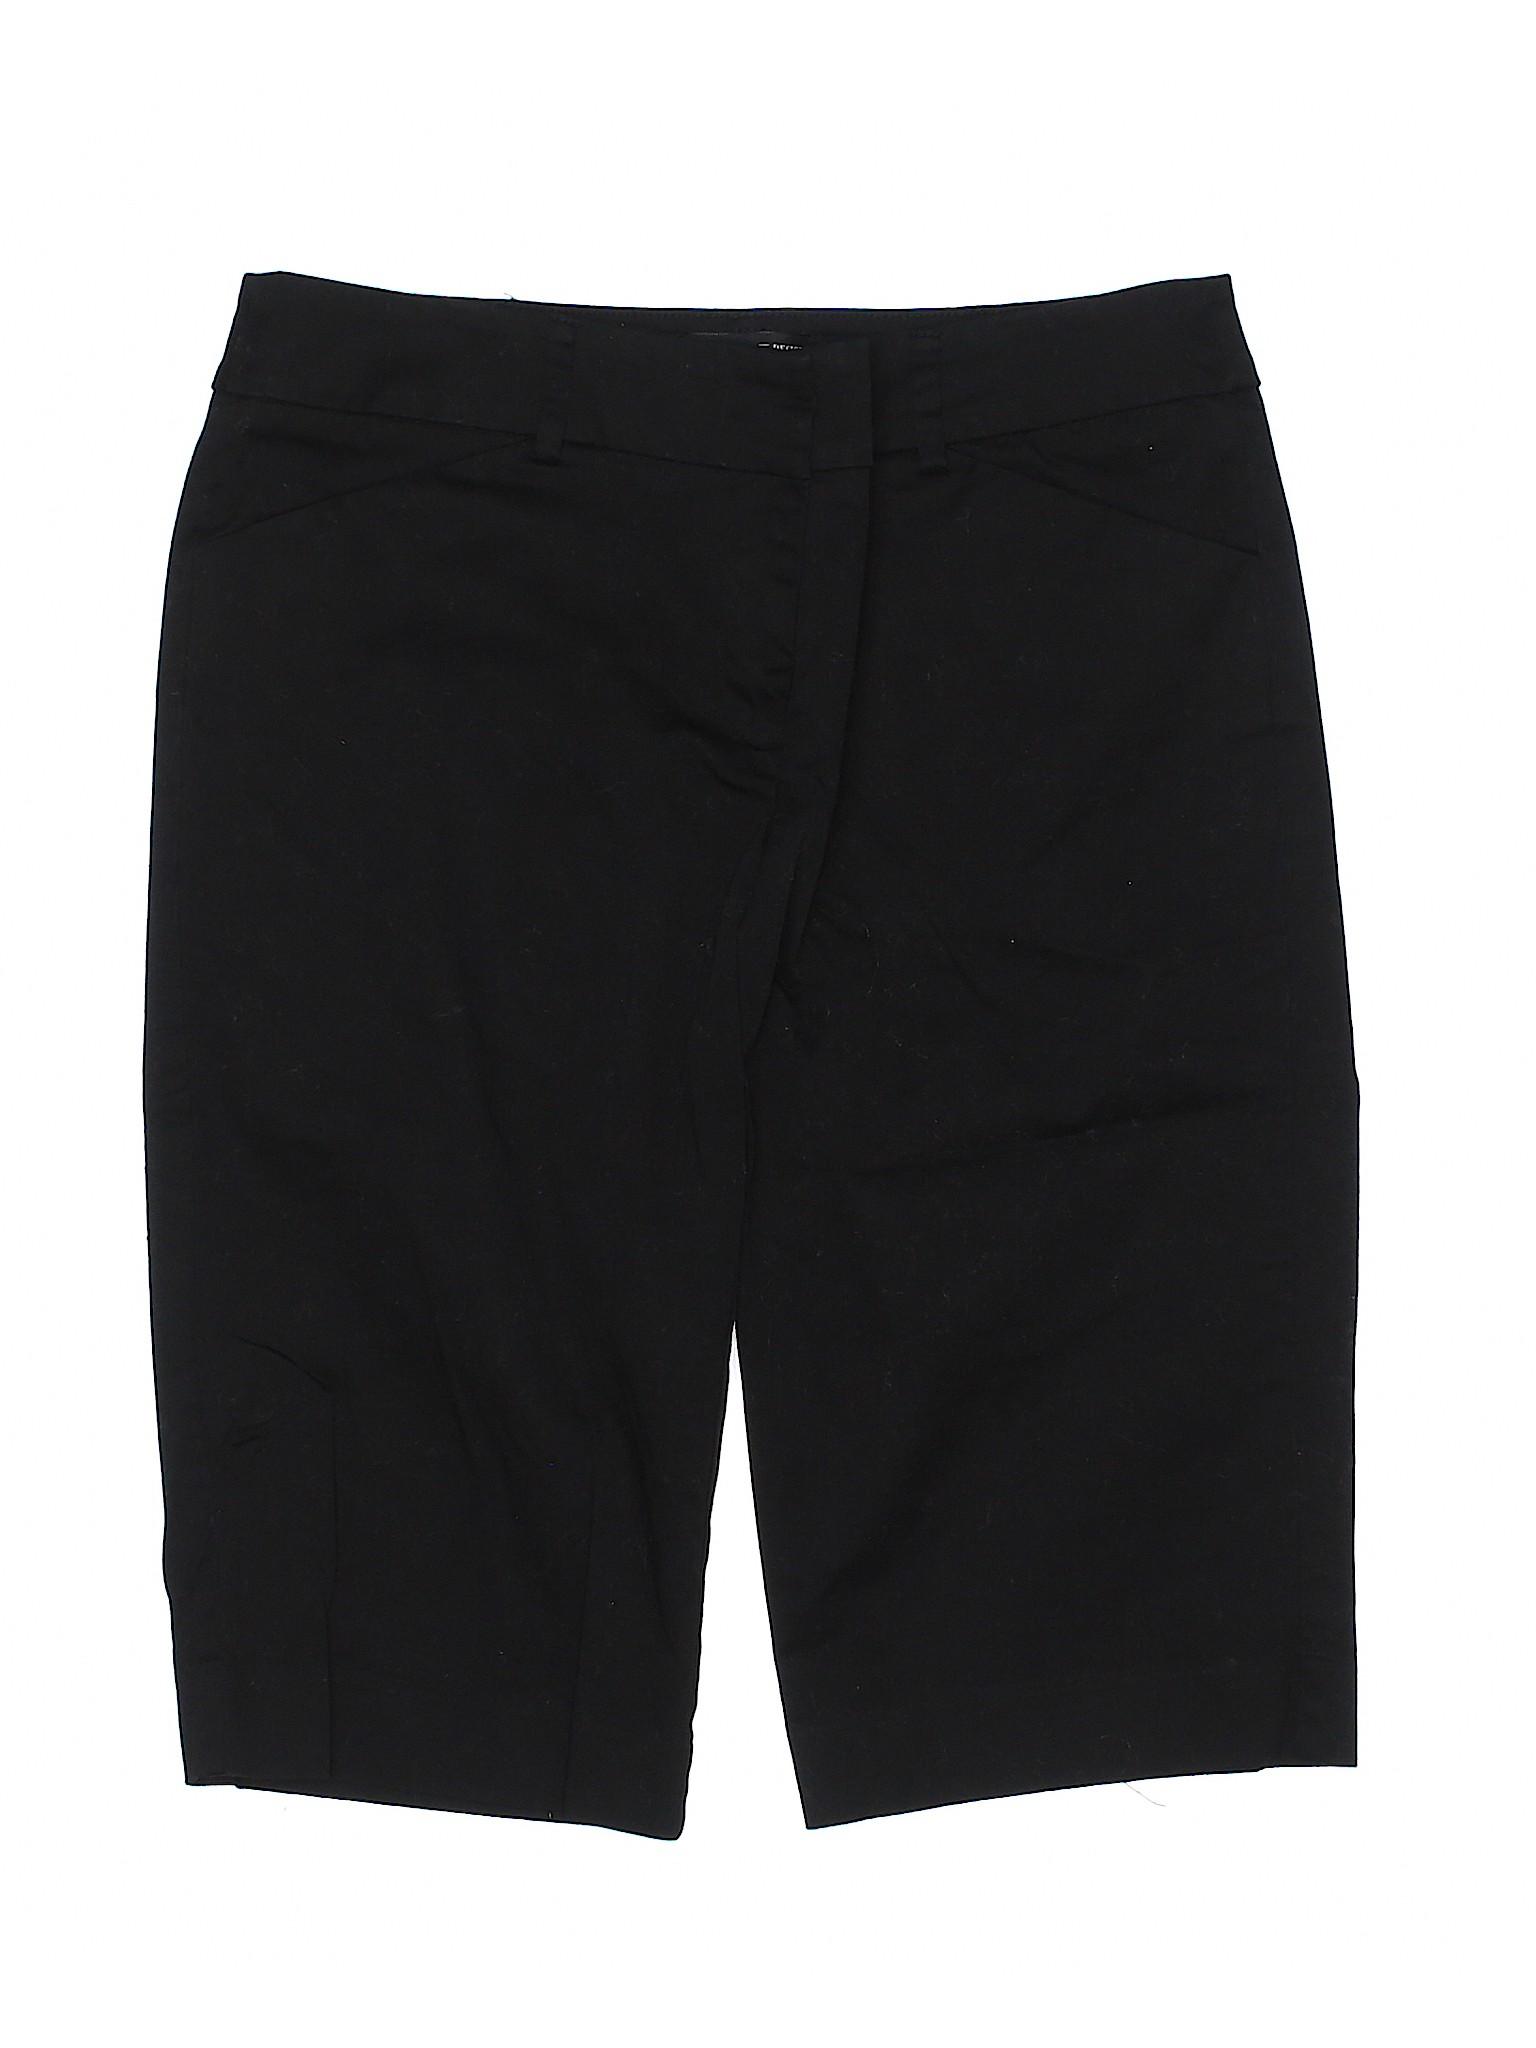 York Company Boutique 7th Avenue Studio amp; Design New Shorts Khaki U1wpwCxq